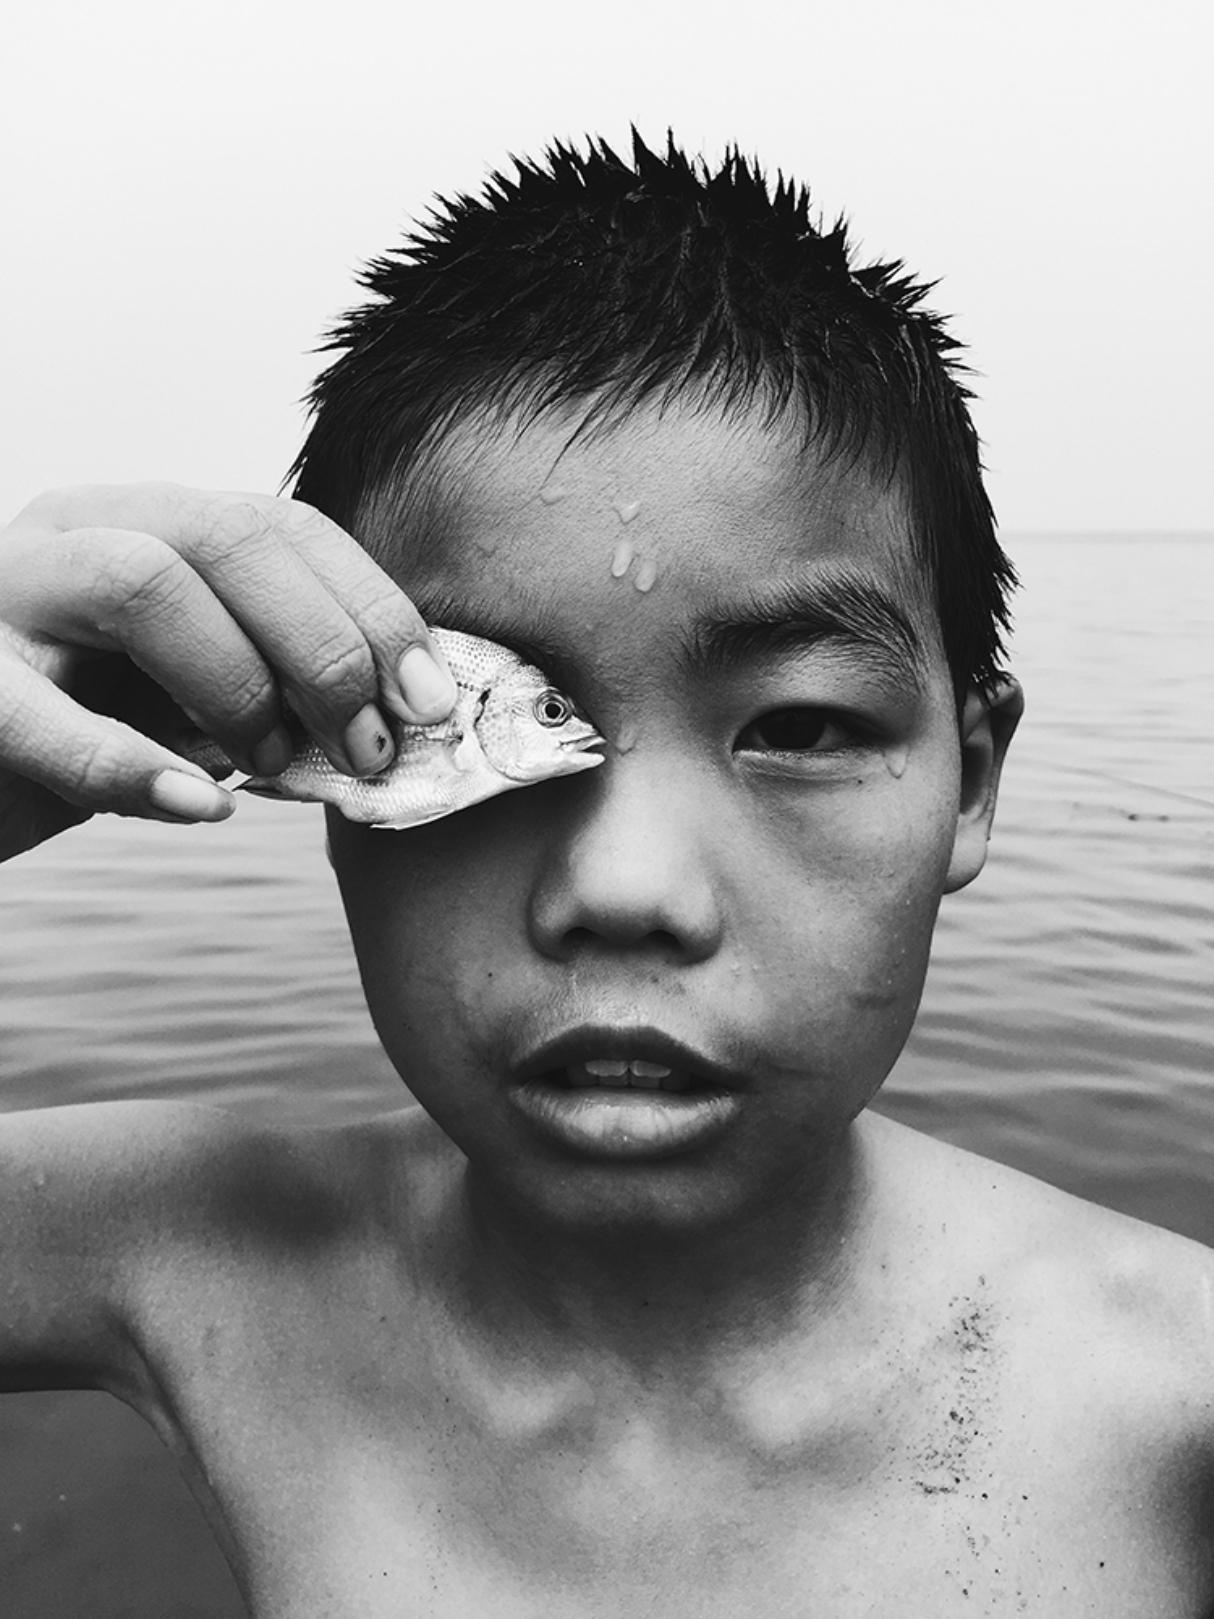 iphone-photography-awards-2018-winners-huapeng-zhao